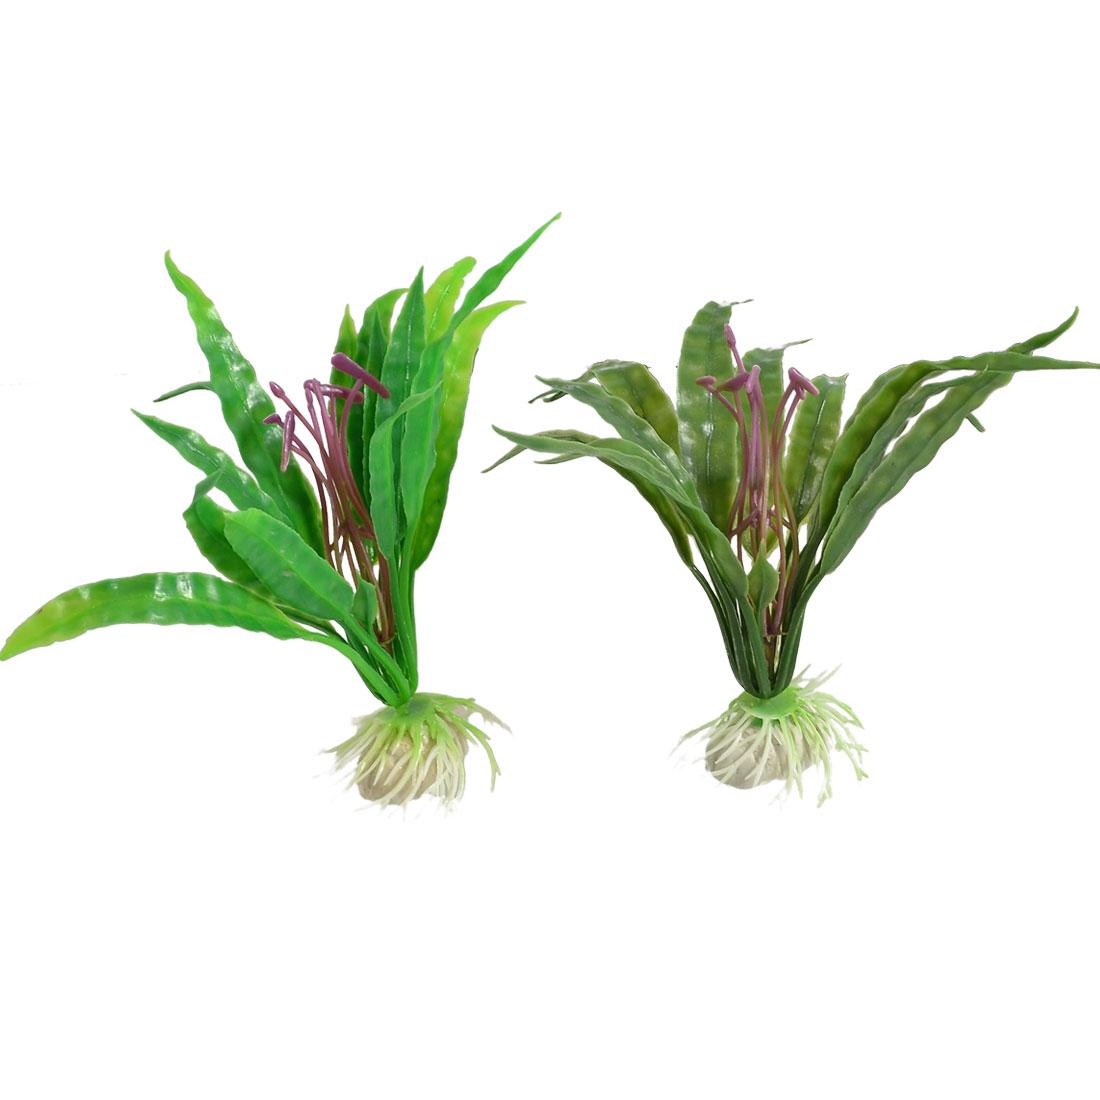 2 Pcs Aquarium Decor Realistic Green Plastic Grass Purple Flower Plant